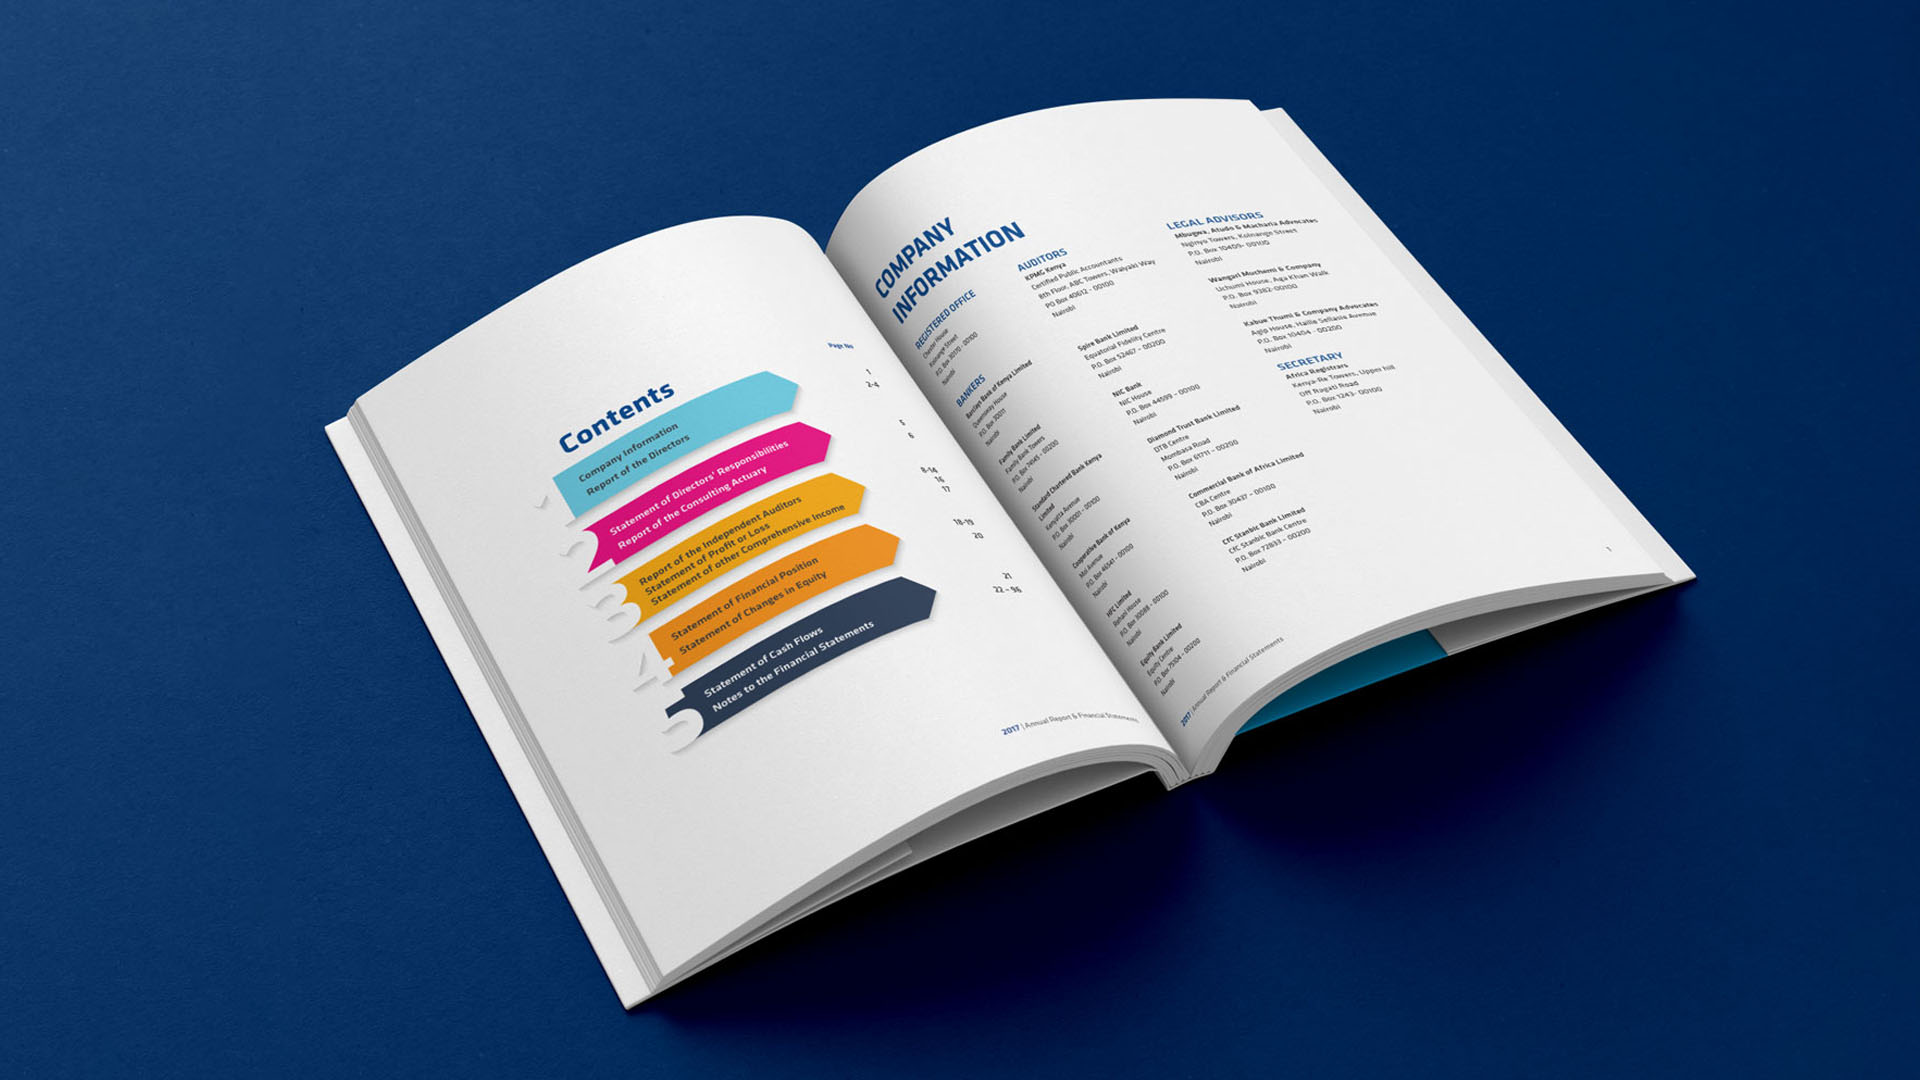 Kenyan Alliance Annual Report Design